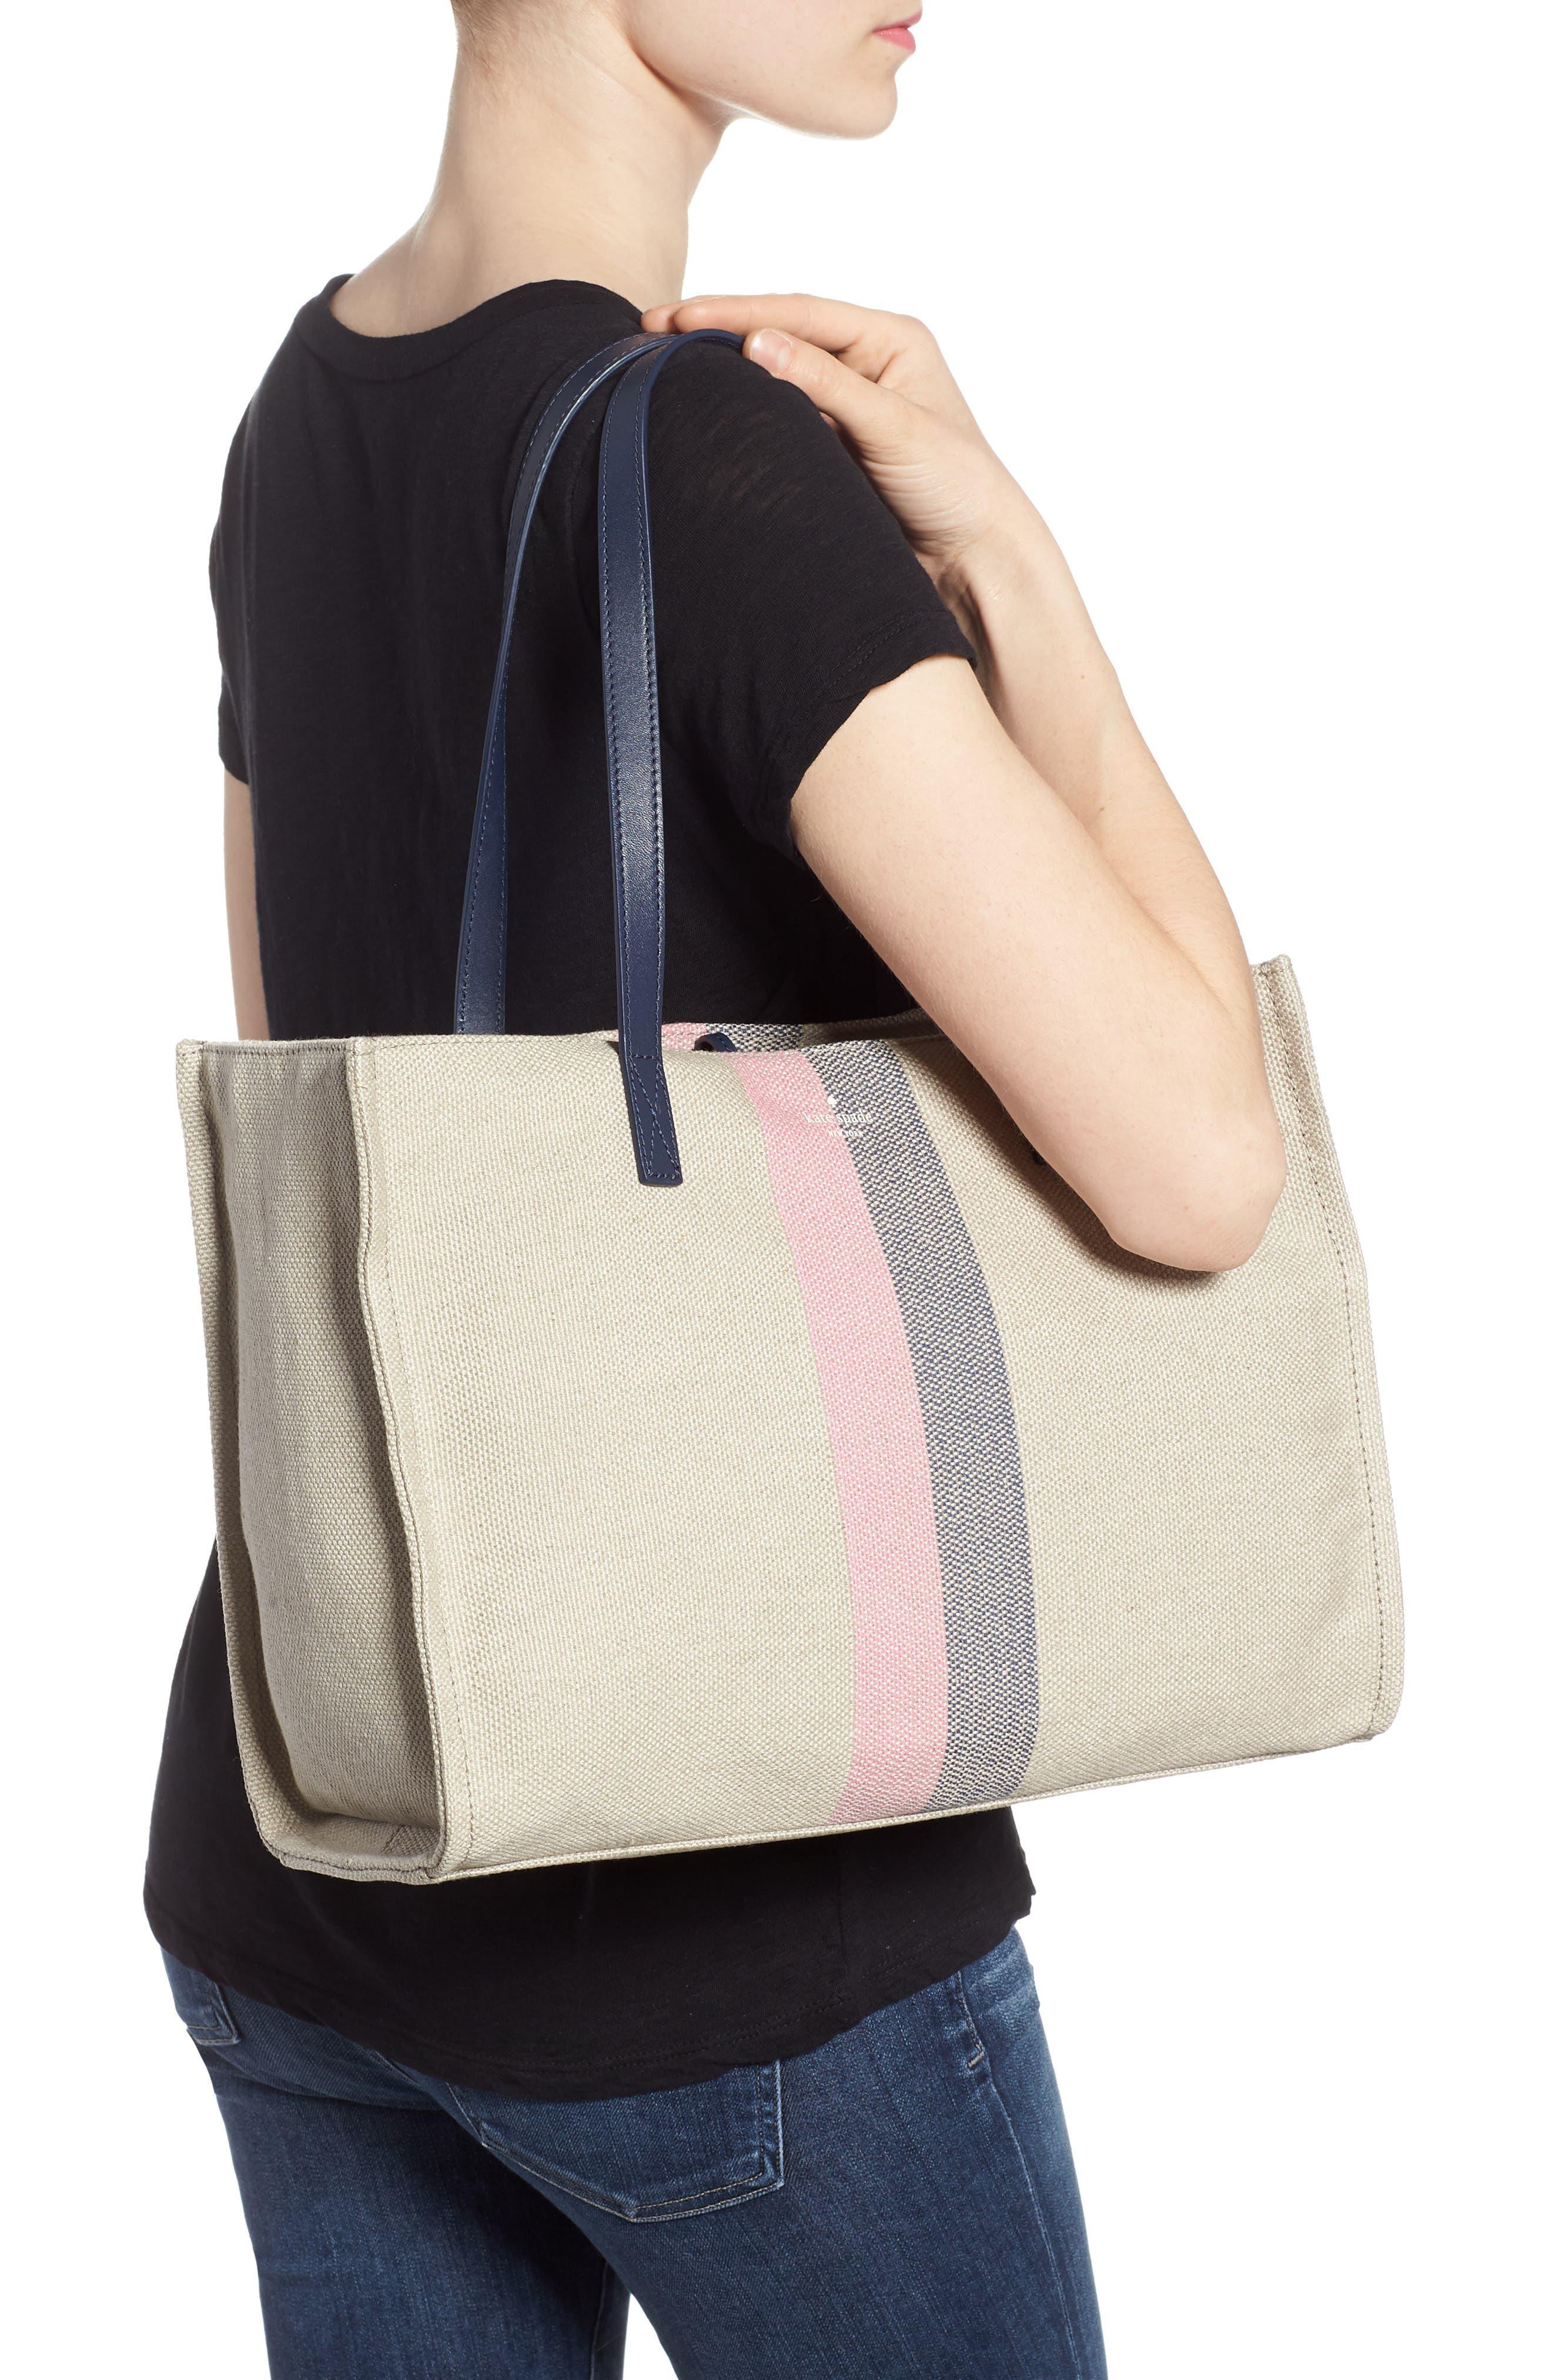 washington square - mega sam canvas satchel,                             Alternate thumbnail 2, color,                             Natural Linen/Bubble Gum/Navy